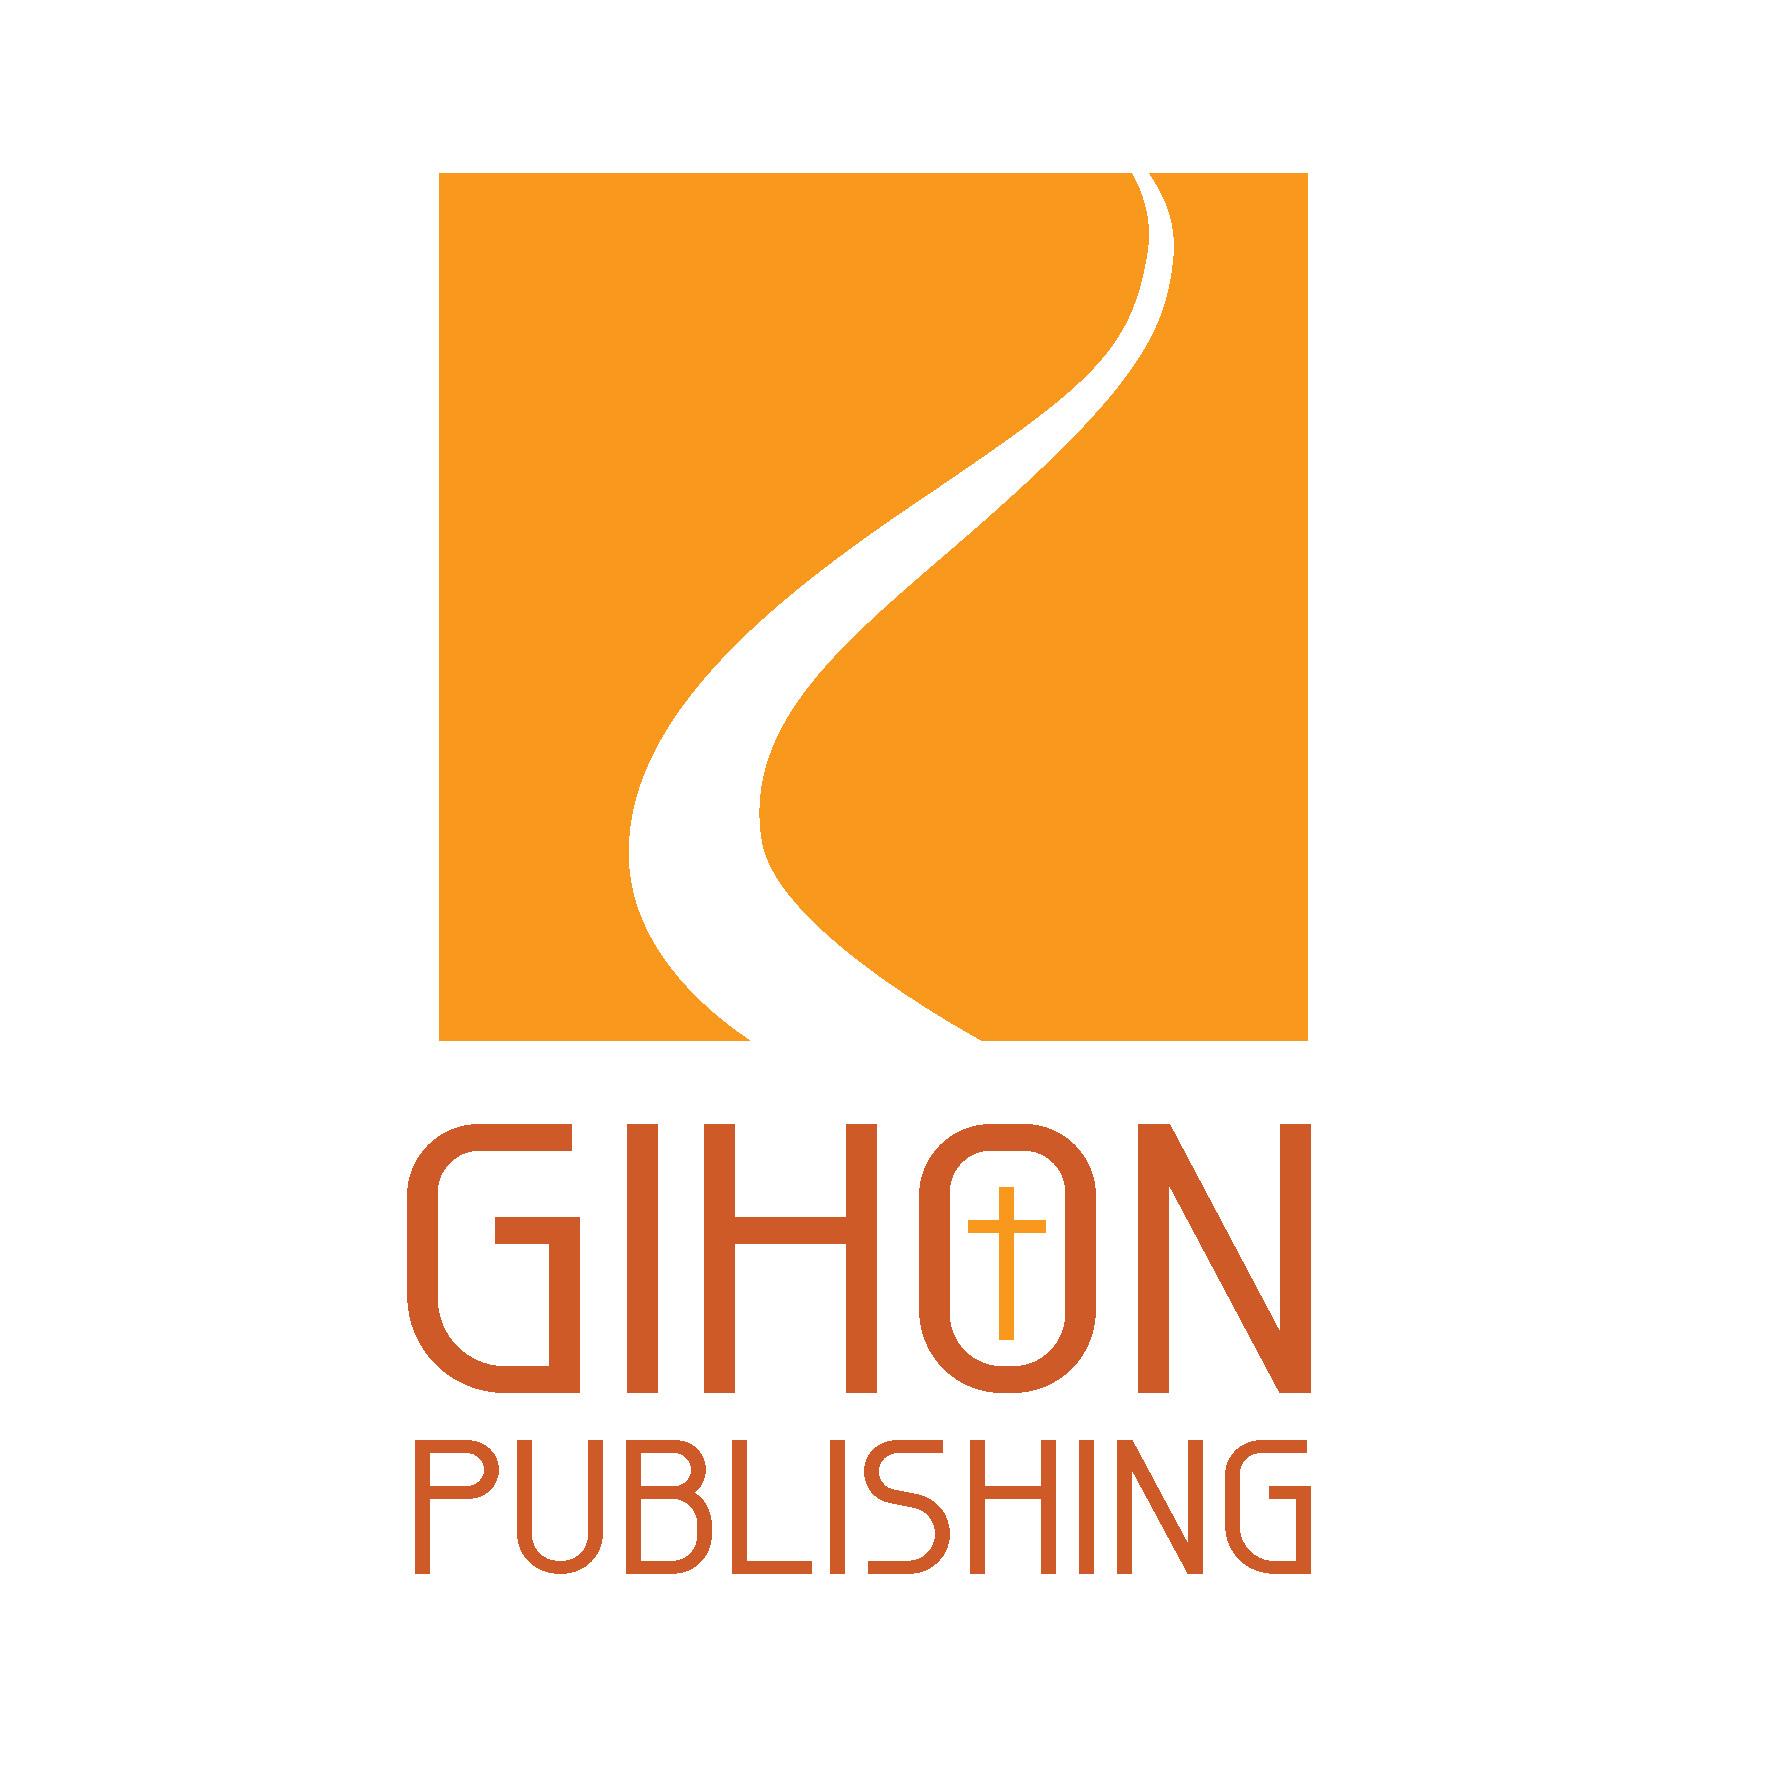 Gihon Publishing Blog: Heavenly Treasures Ministries www.gihonpublishing.co.uk